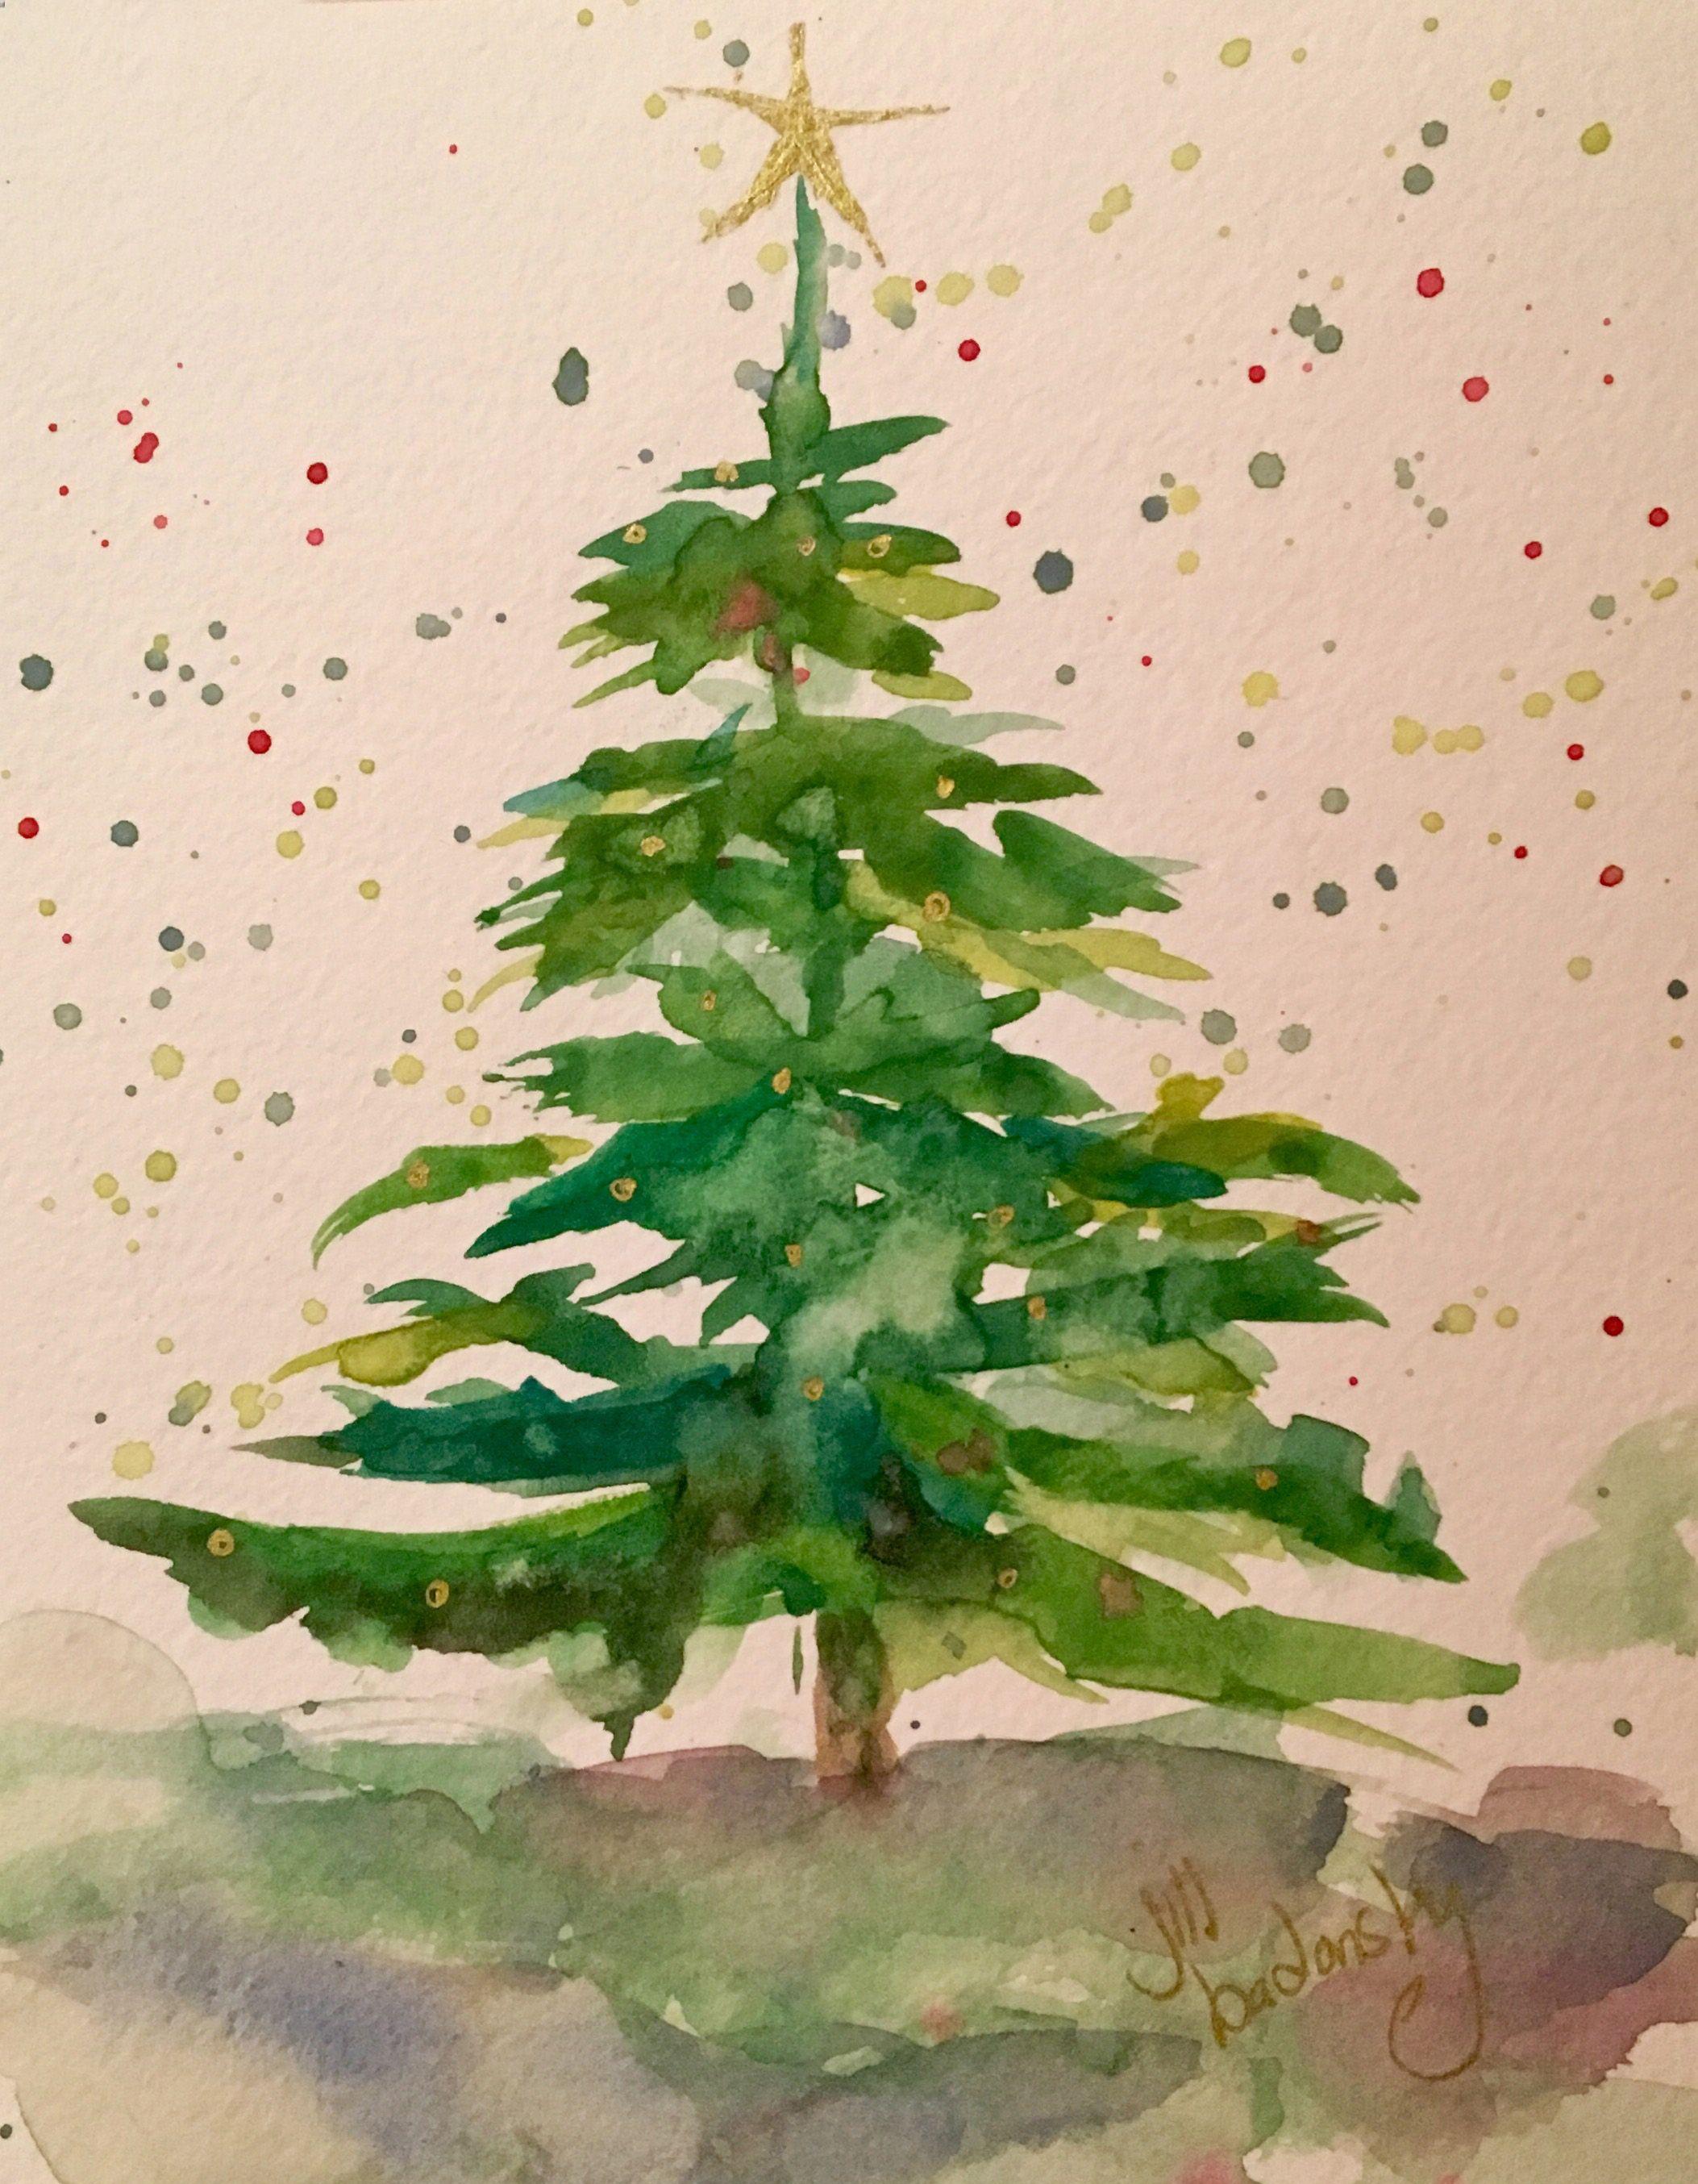 jill badonsky says merry christmas tree malen aquarell. Black Bedroom Furniture Sets. Home Design Ideas